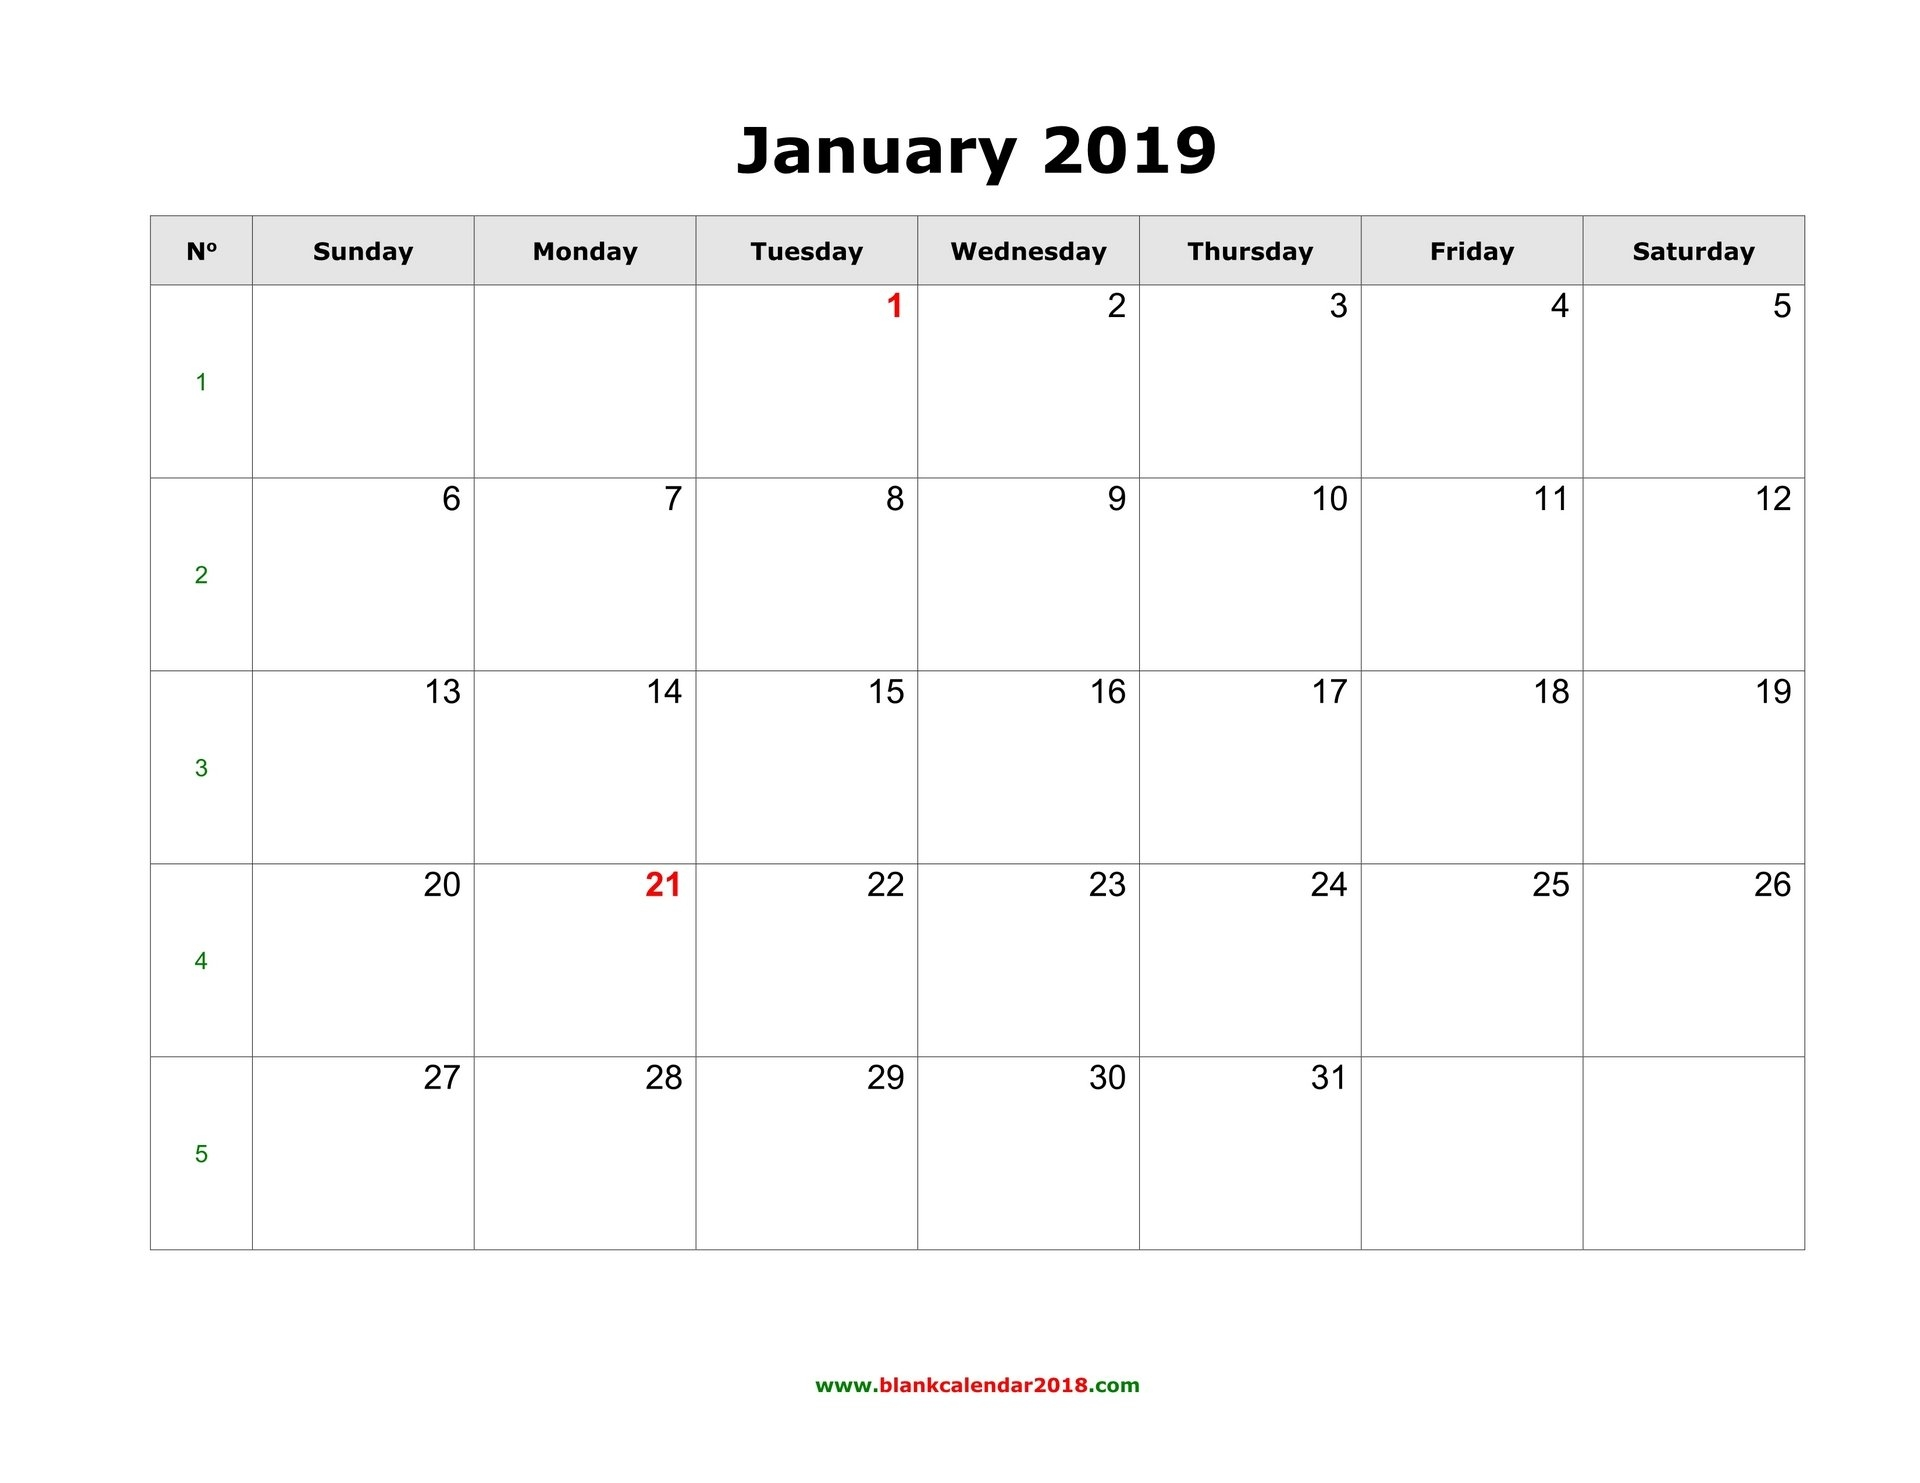 Blank Calendar For January 2019 Calendar 2019 Interactive